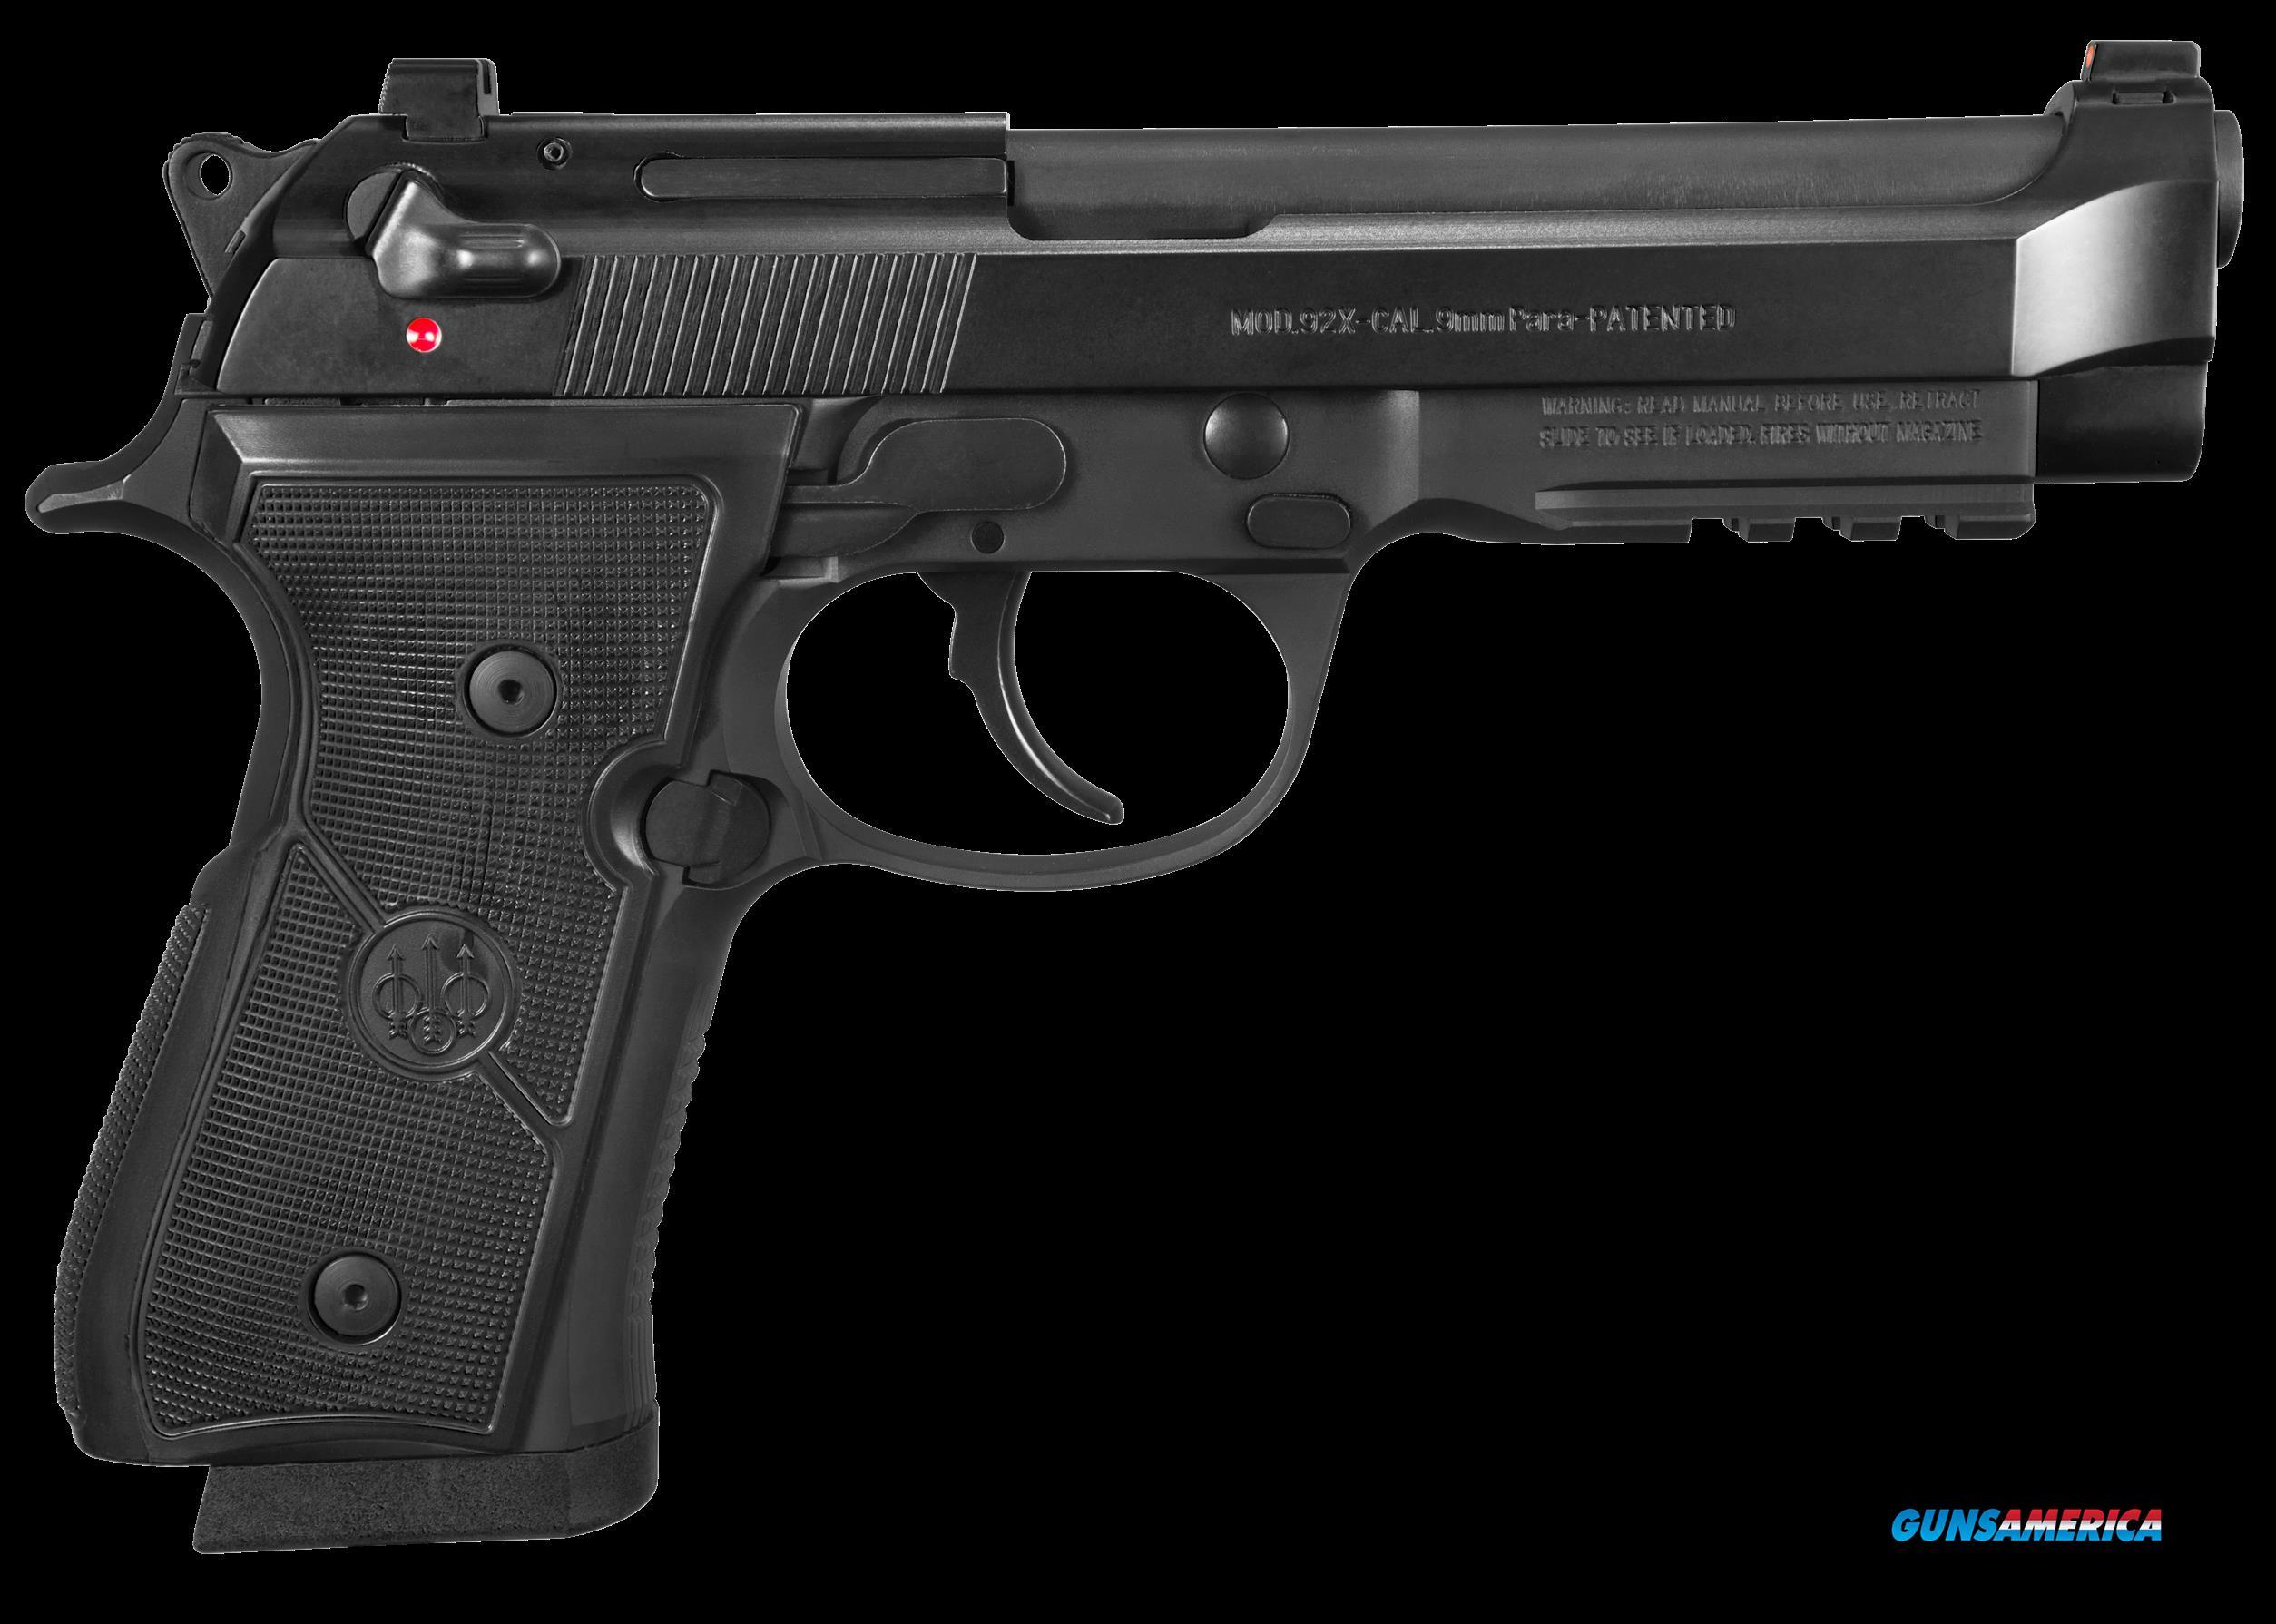 Beretta Usa 92x, Ber J92fr920g 92x   9mm Fullsize  3-10rd  *usa*  Guns > Pistols > 1911 Pistol Copies (non-Colt)